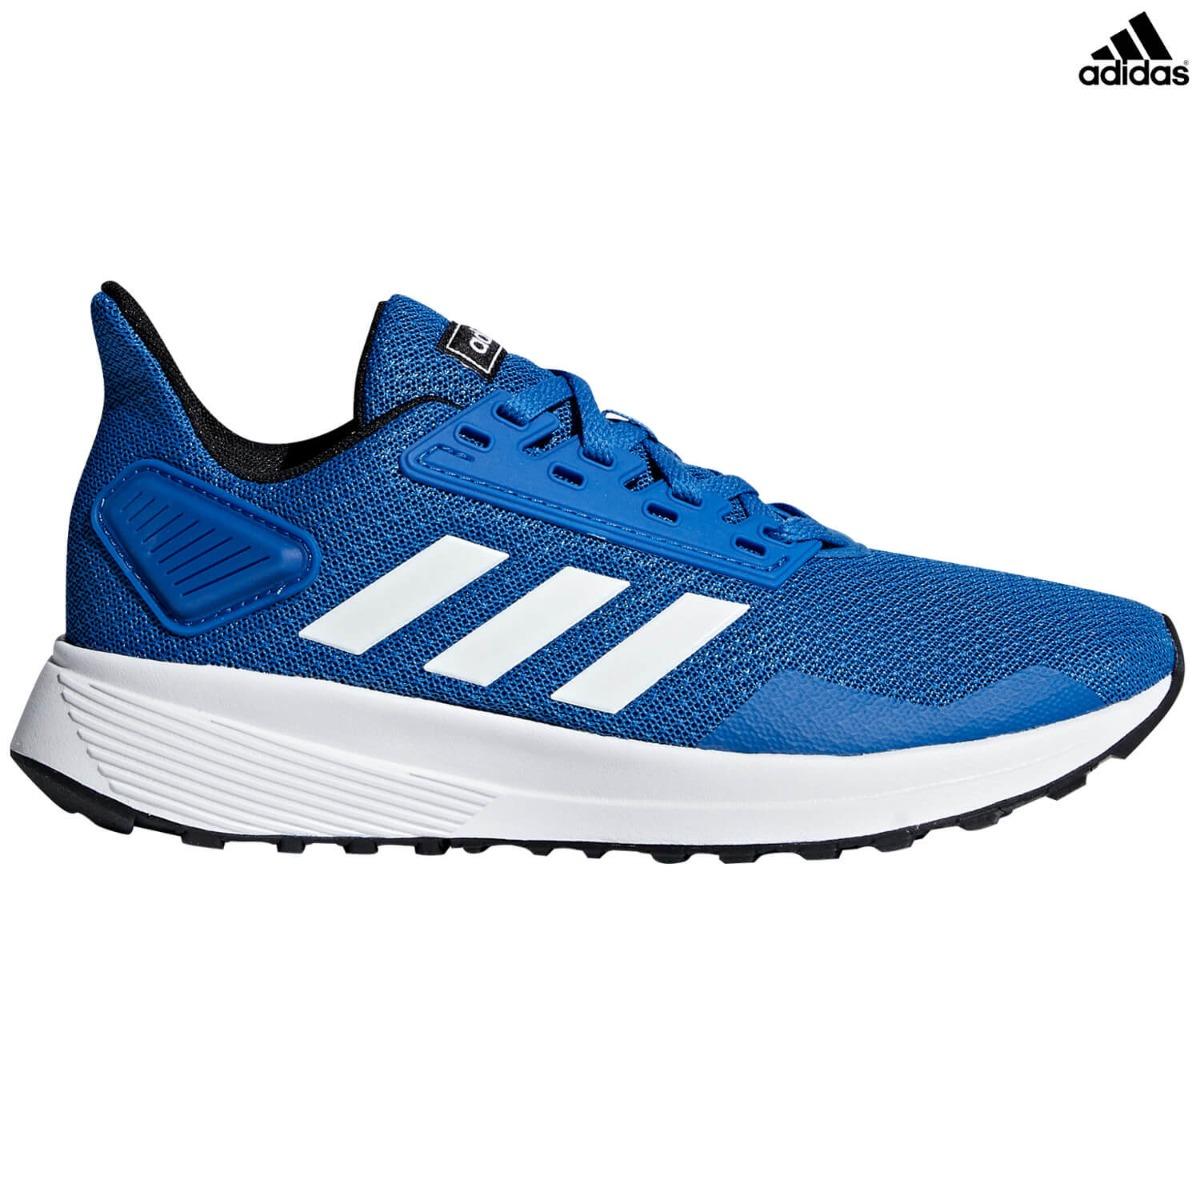 201a503af7f adidas Duramo 9 Kids Shoes, blue| Running